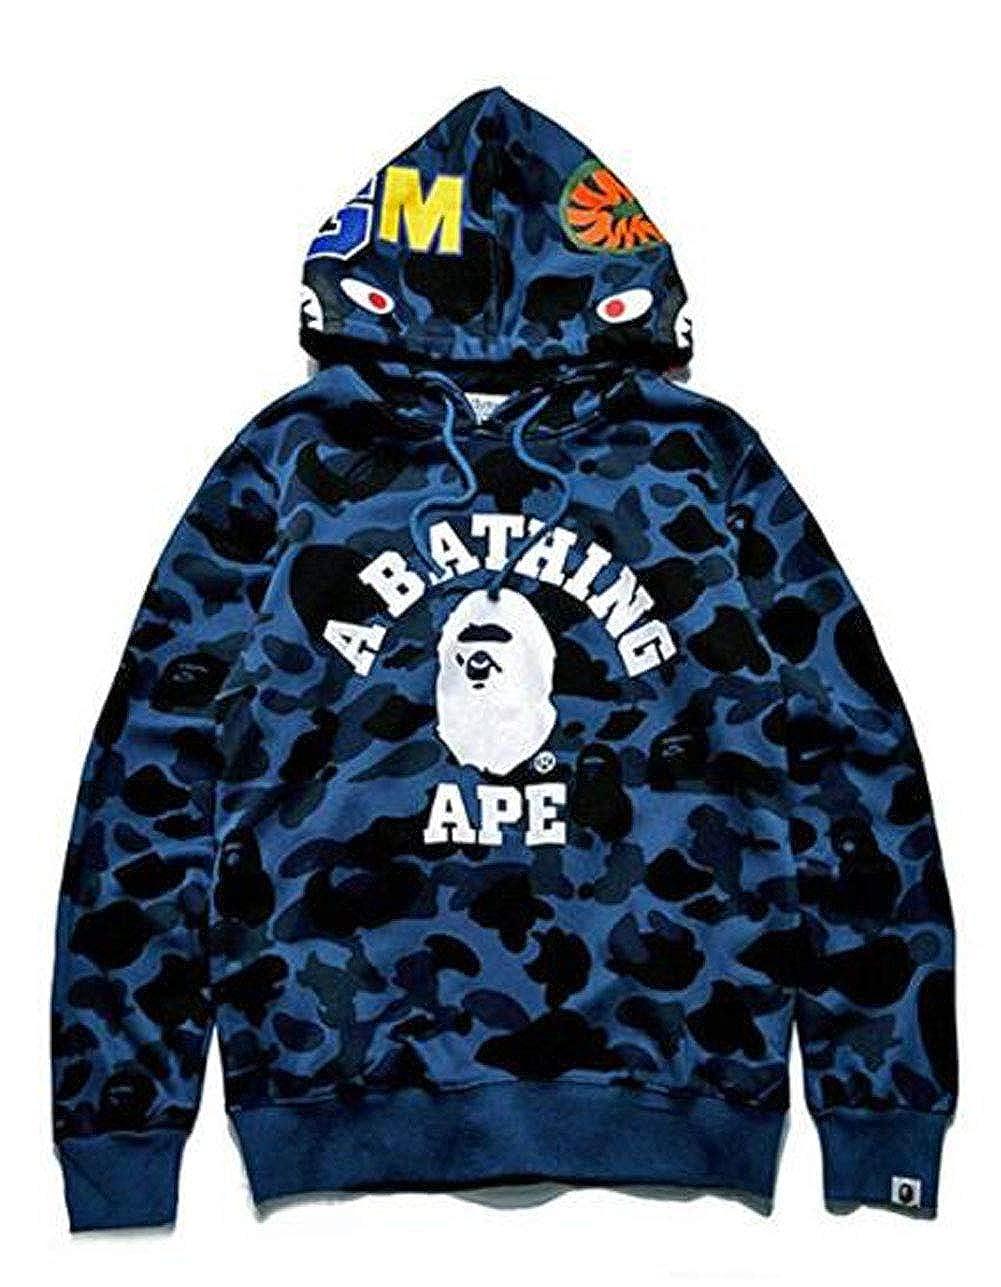 QingShuiYuan Mens Bape Hoodies Bathing Ape Jacket Fashion Casual Sweatshirt Coat Outdoor Hip-Hop Funny Tops